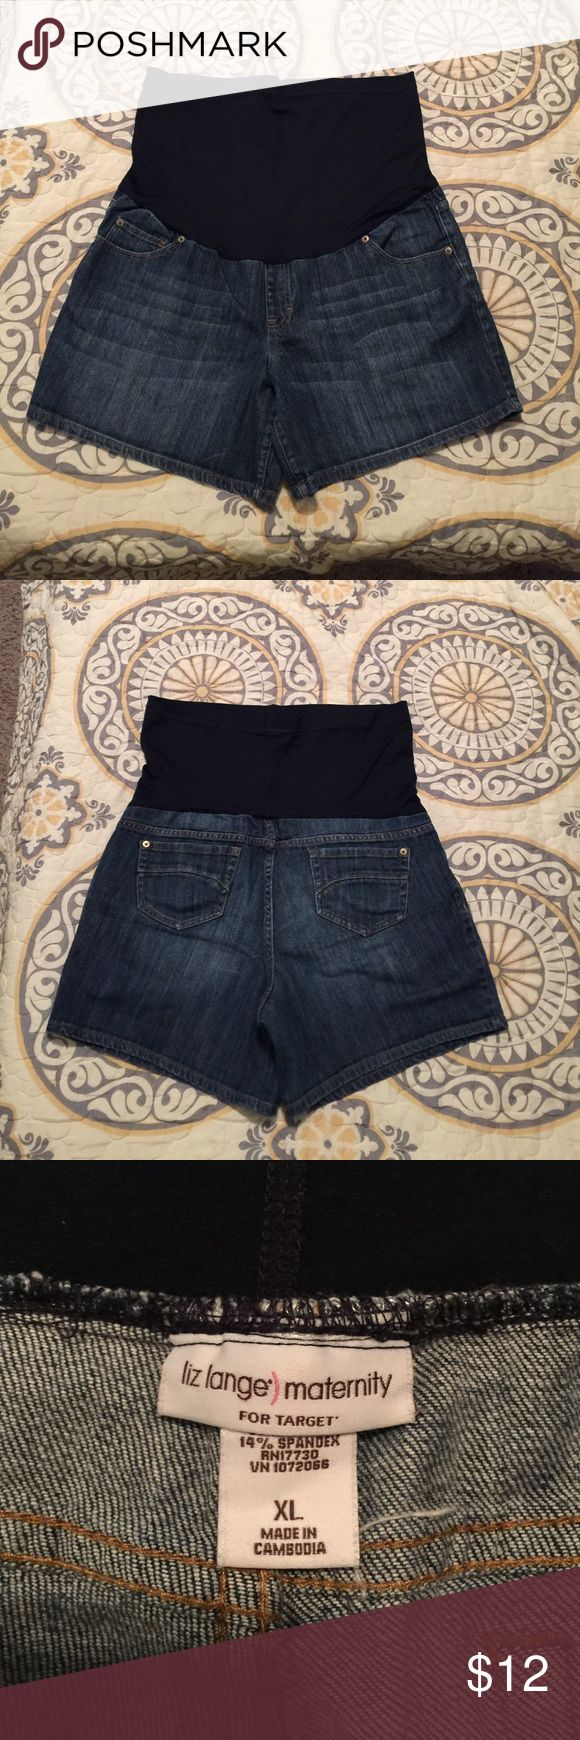 Liz Lange blue jean maternity shorts Full panel Liz Lange blue jean maternity shorts. Excellent condition. Size XL Liz Lange for Target Shorts